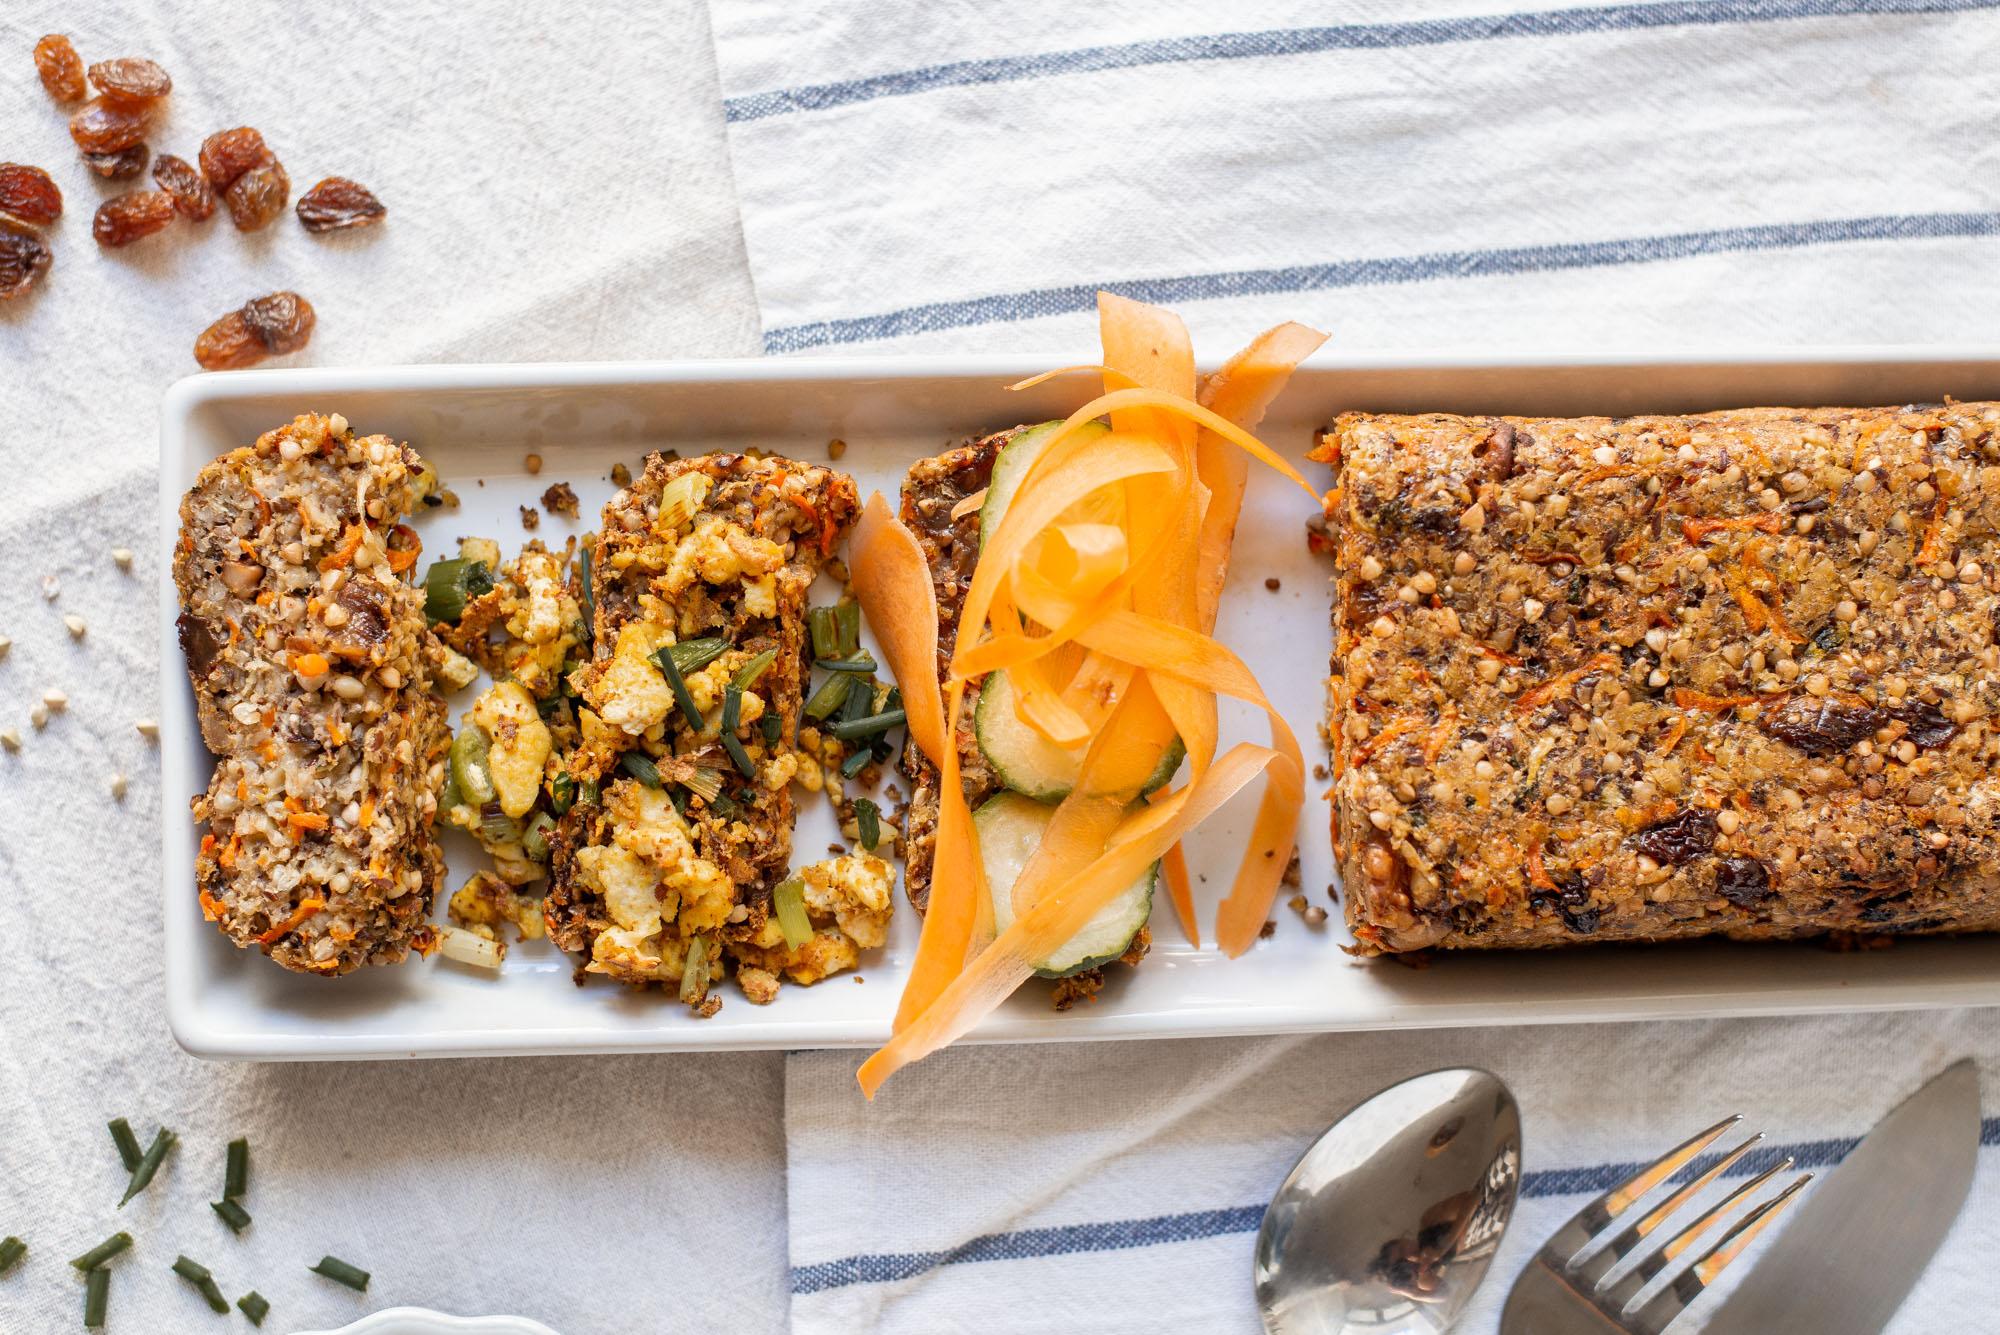 Vegan scrambled eggs: Scrambled Tofu Gluten-free breakfst Vegan